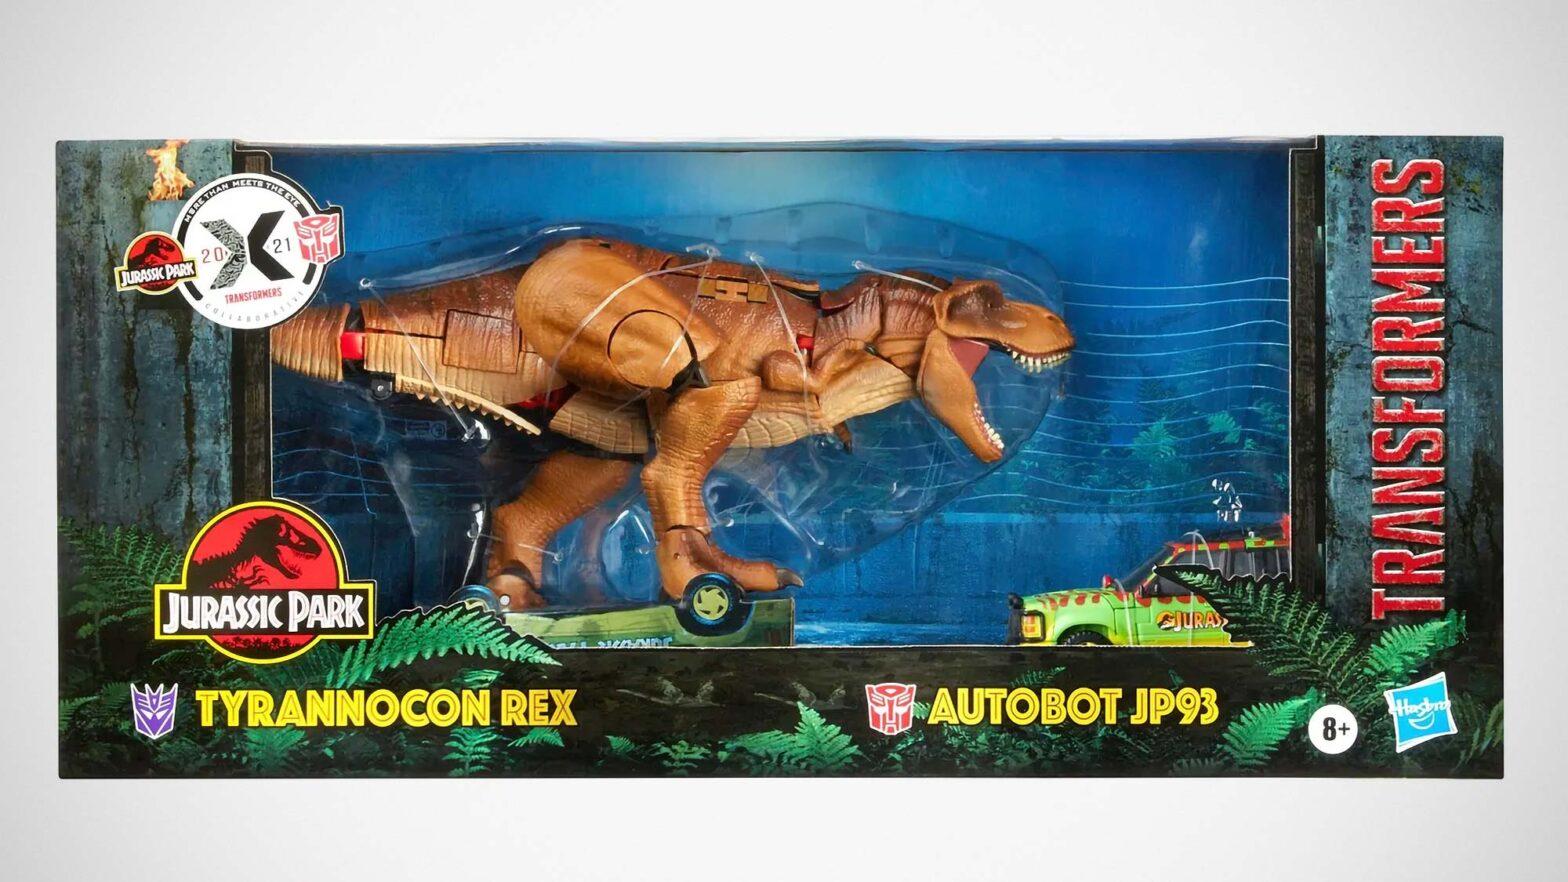 Jurassic Park x Transformers Transforming Action Figure Set